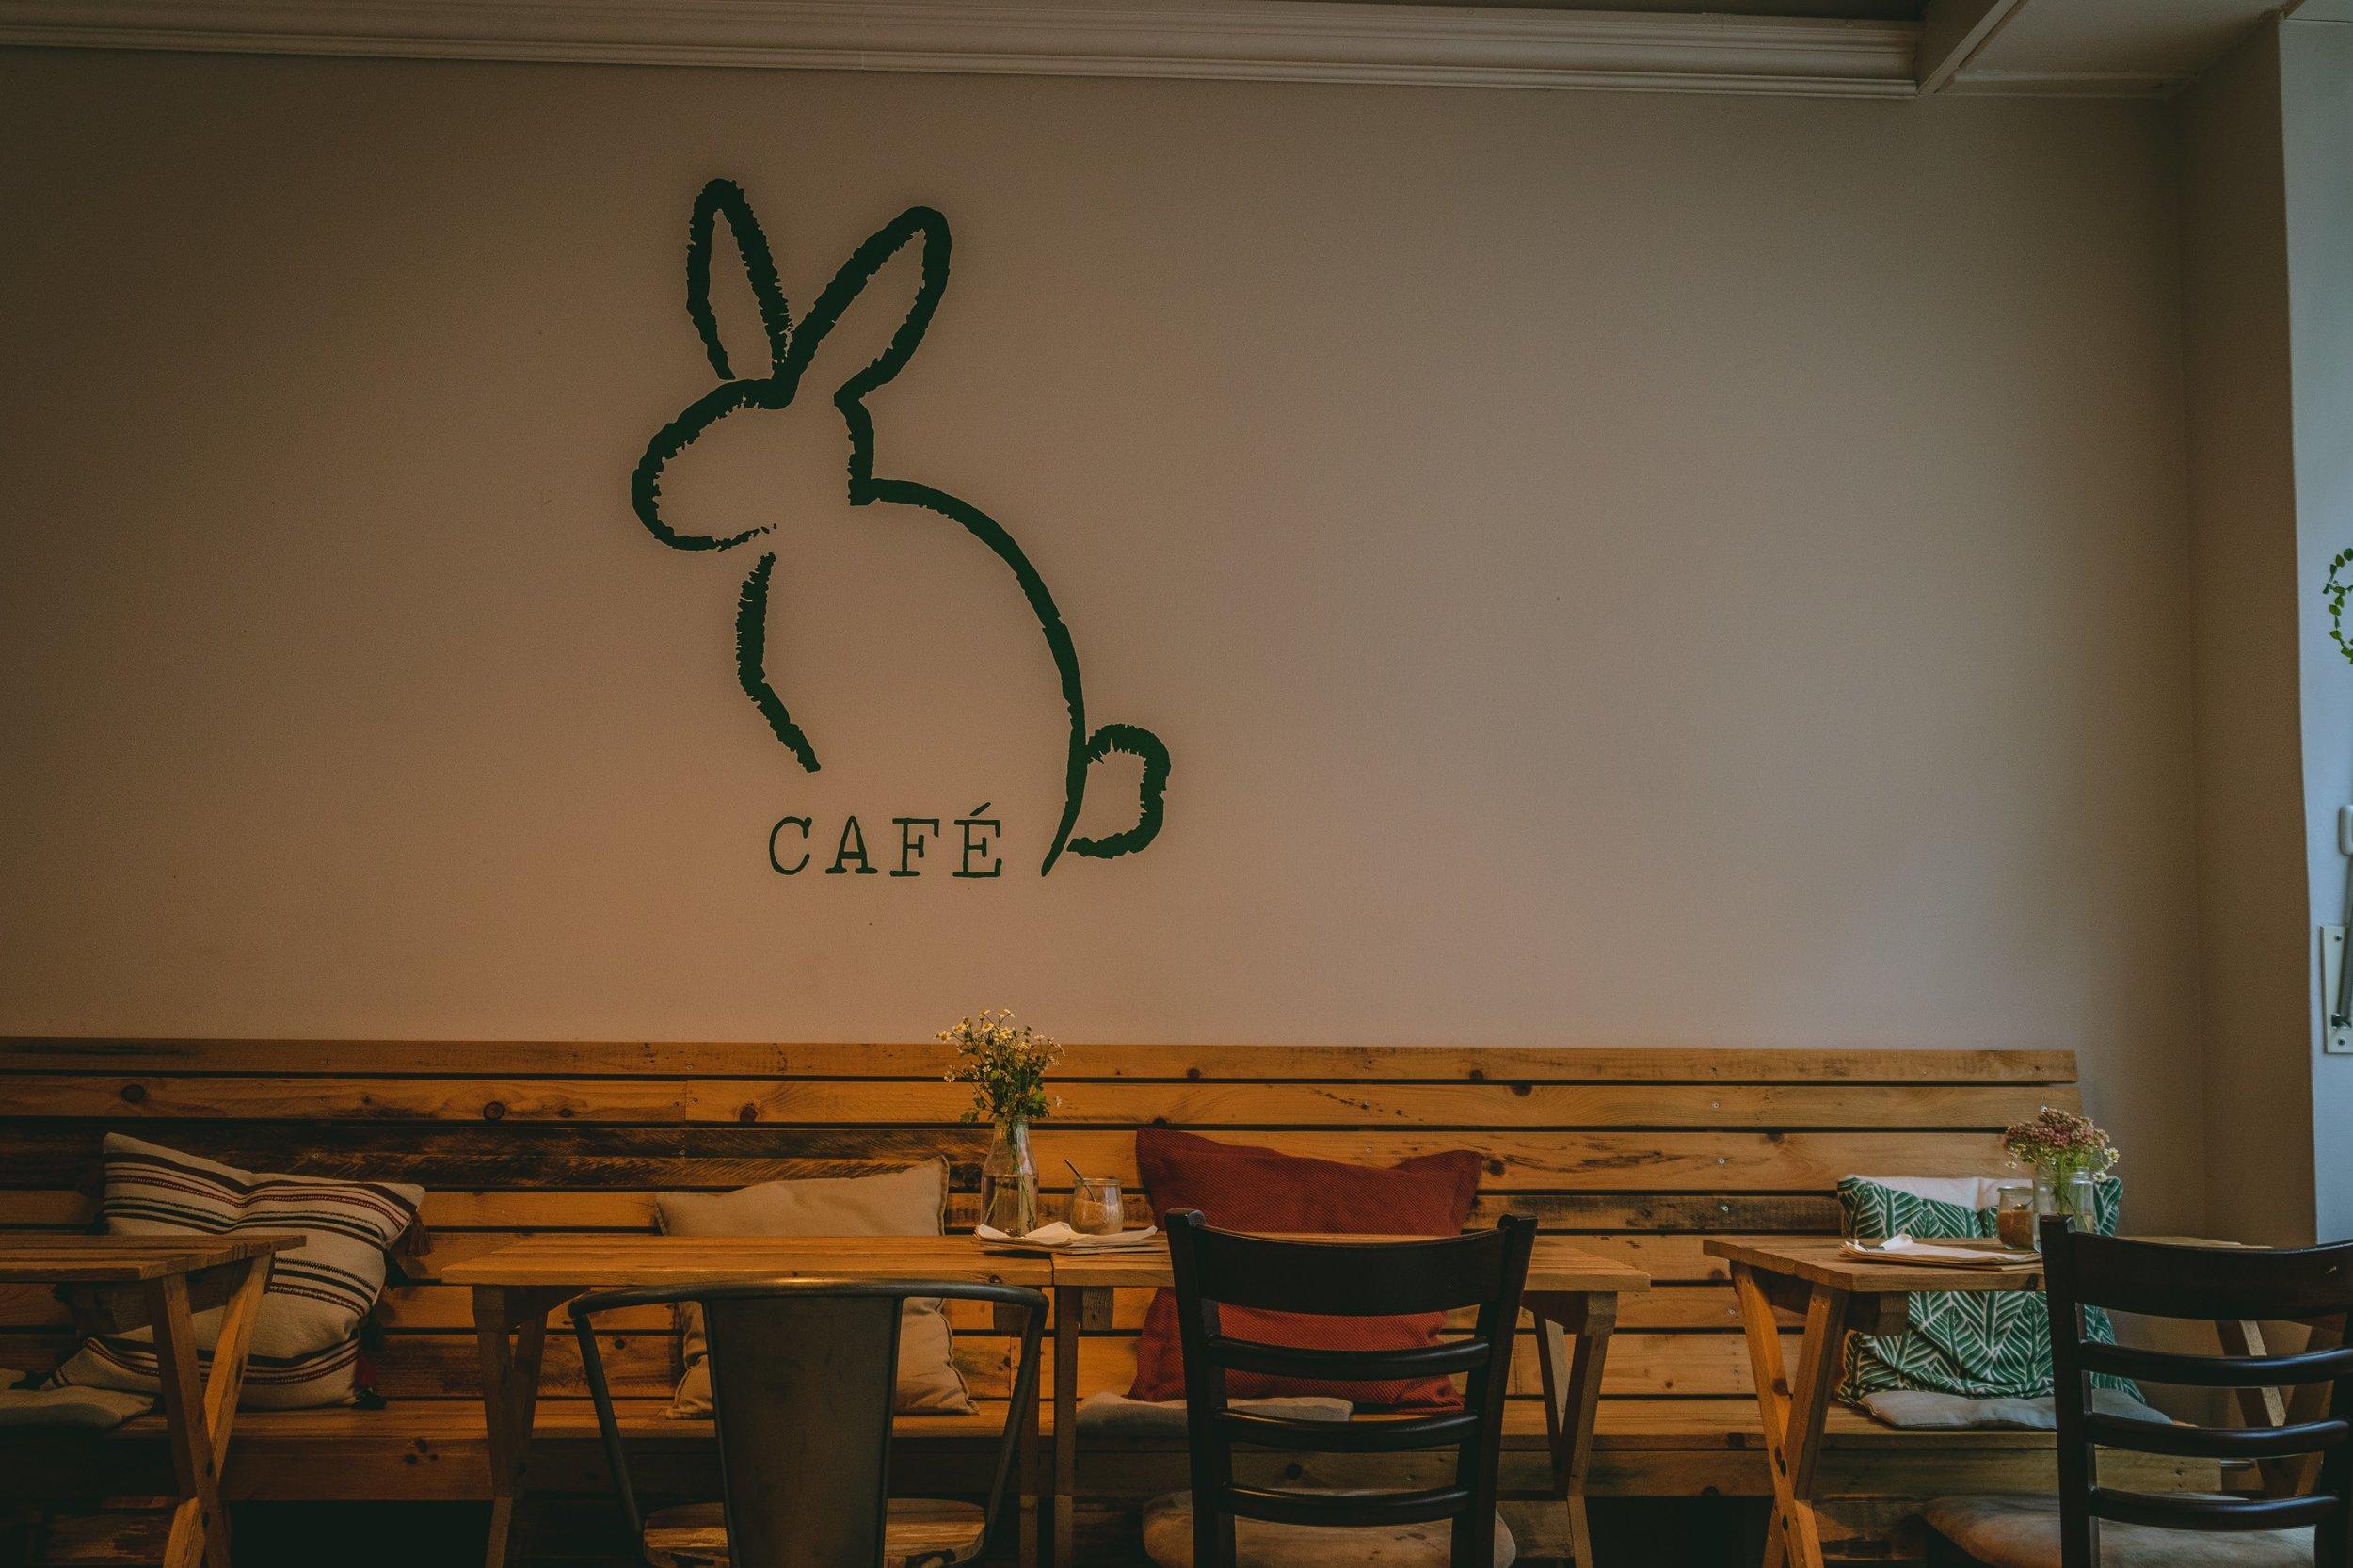 Café hase   - Location | Café hase